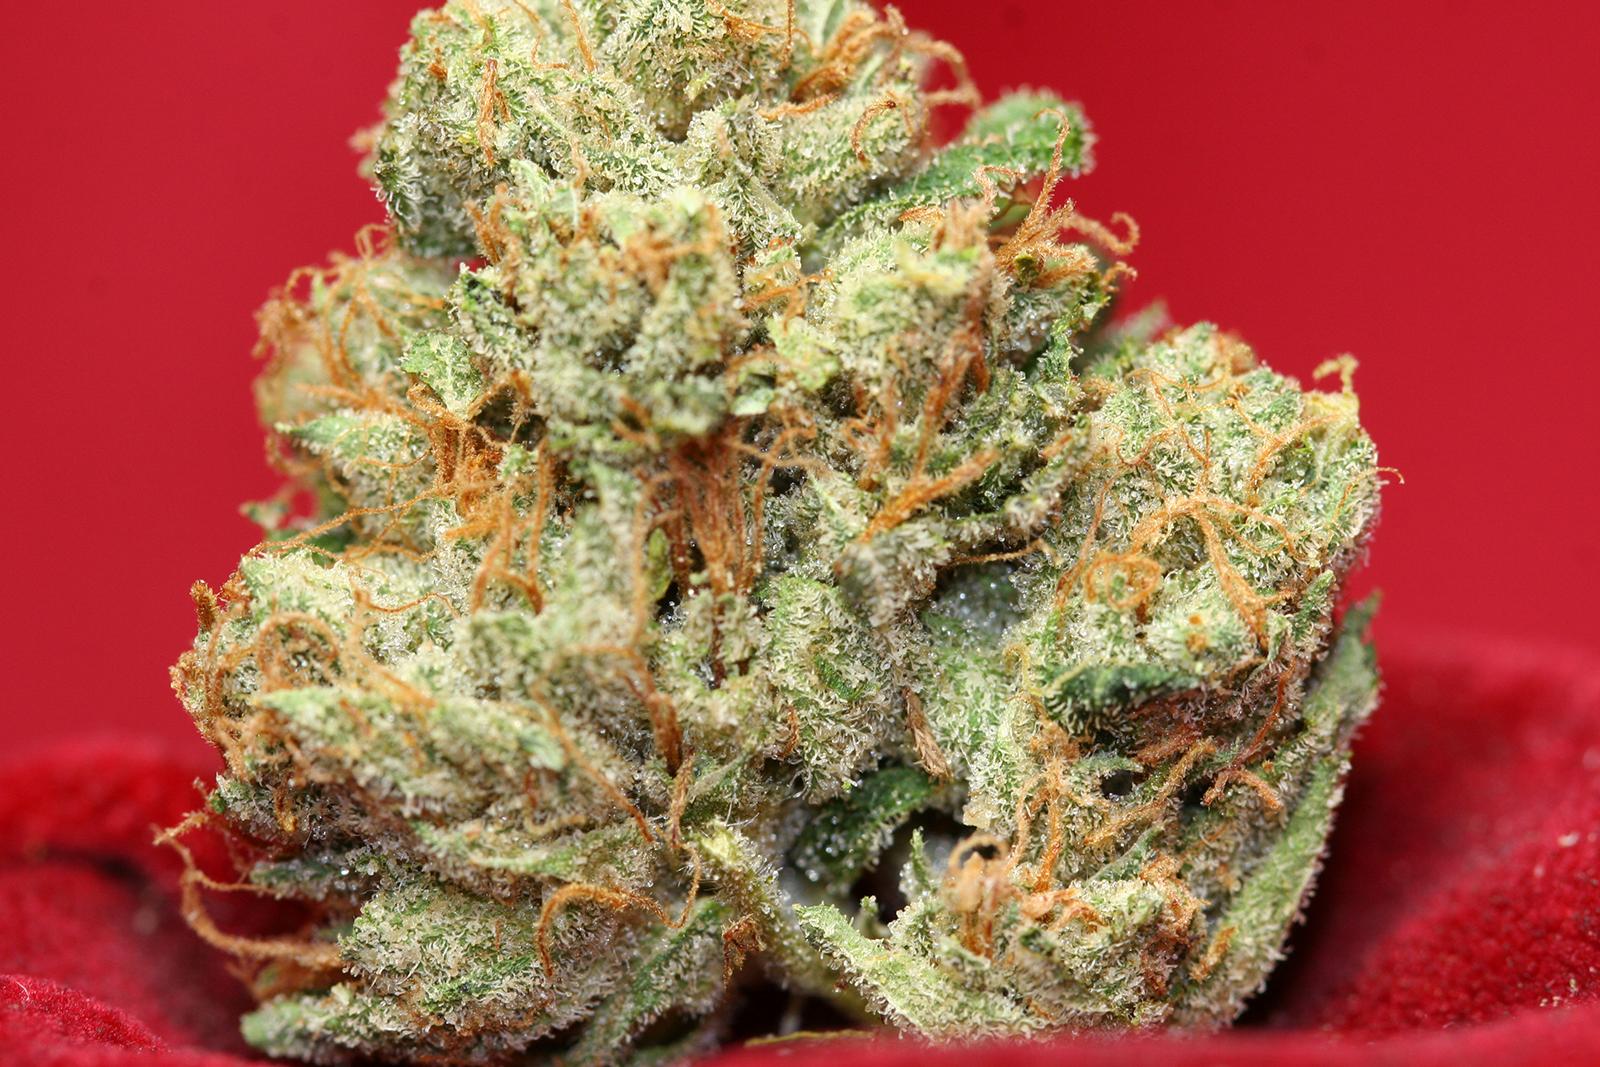 jupiter-weed